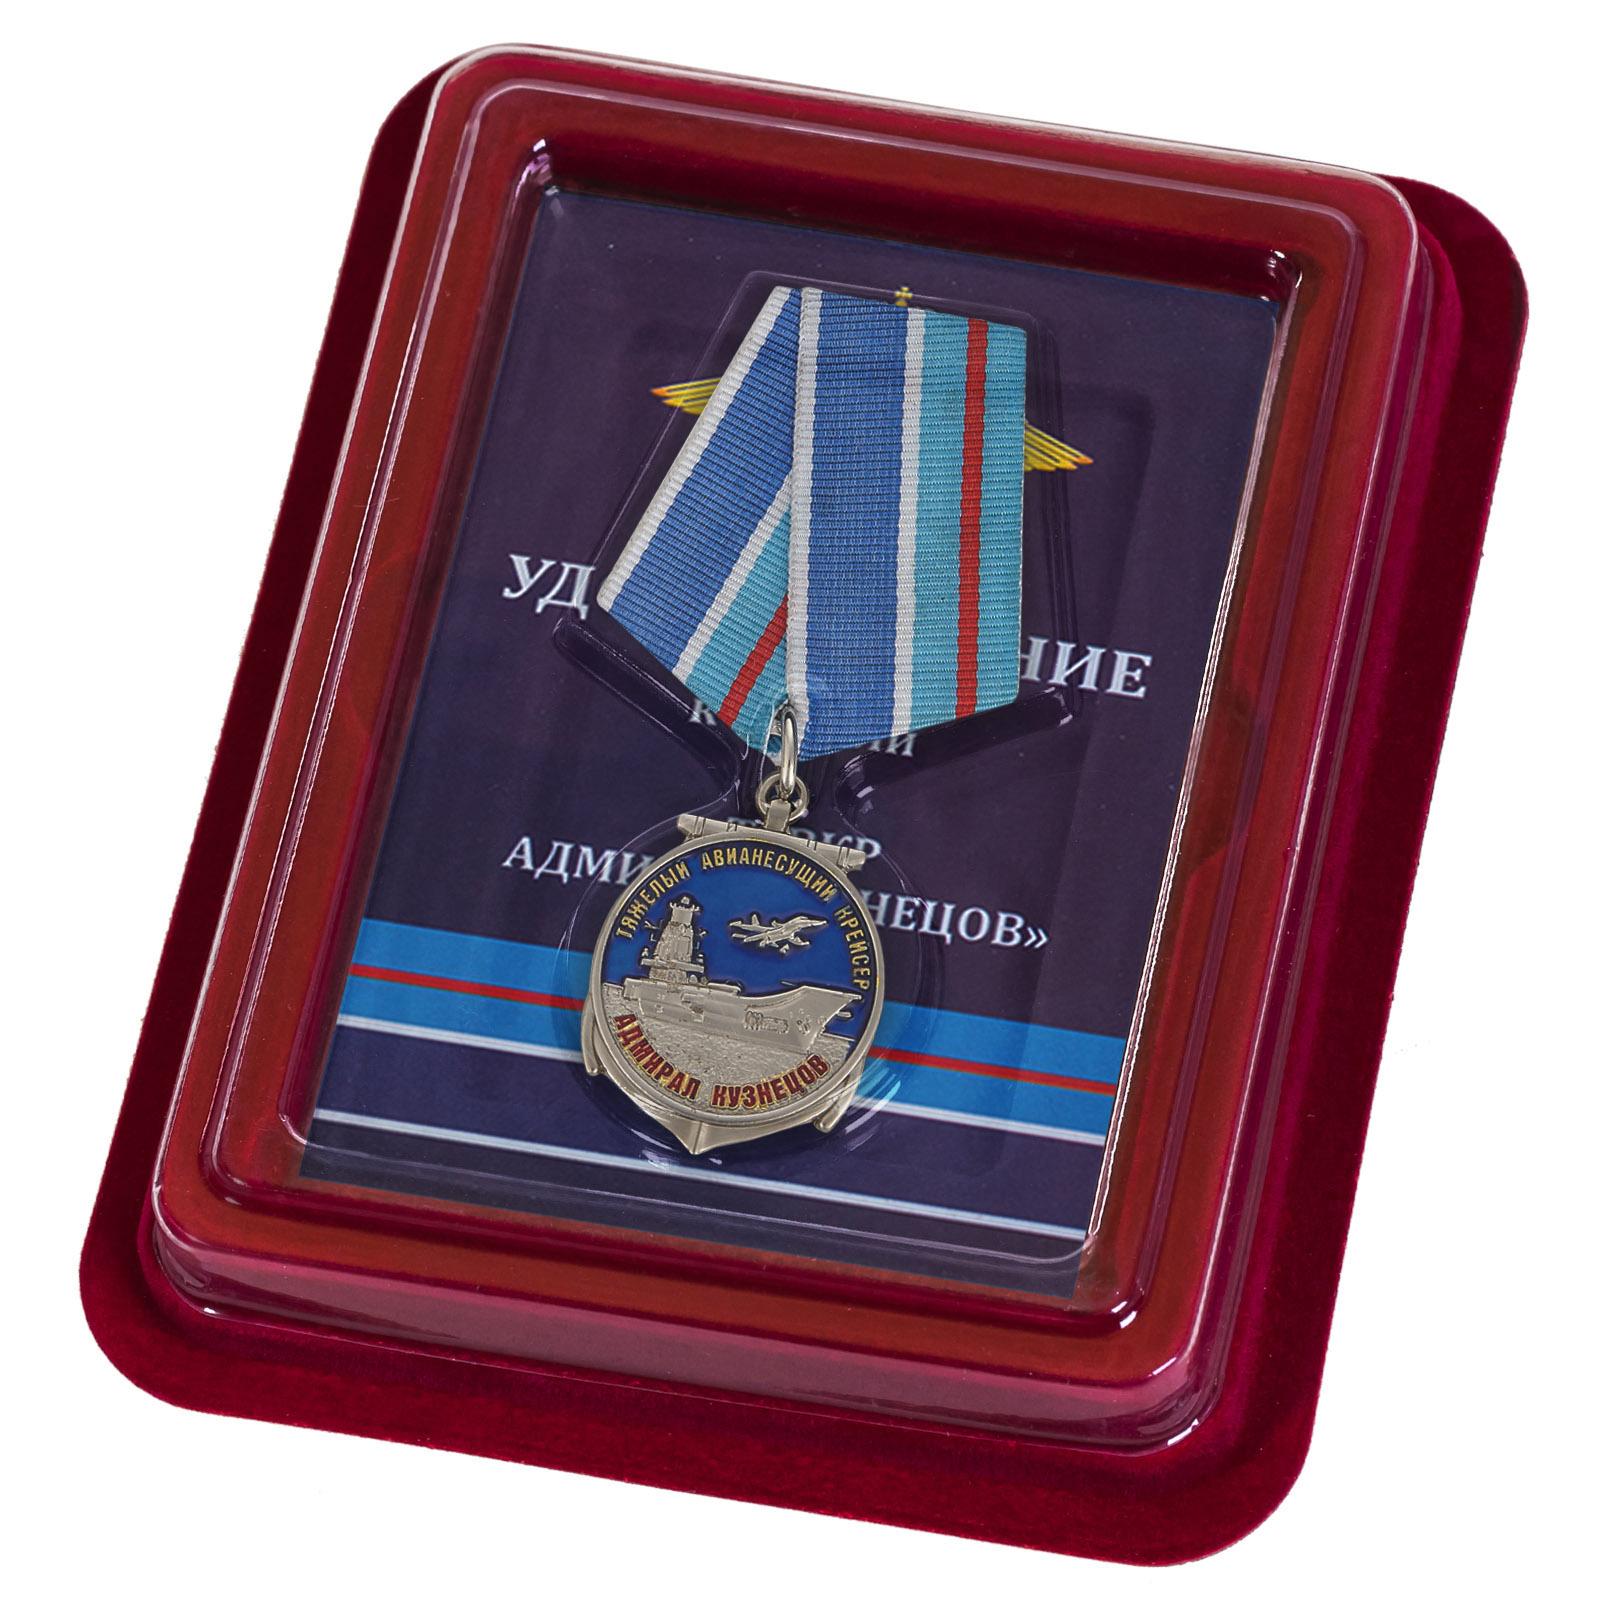 Памятная медаль Адмирал Кузнецов - в футляре